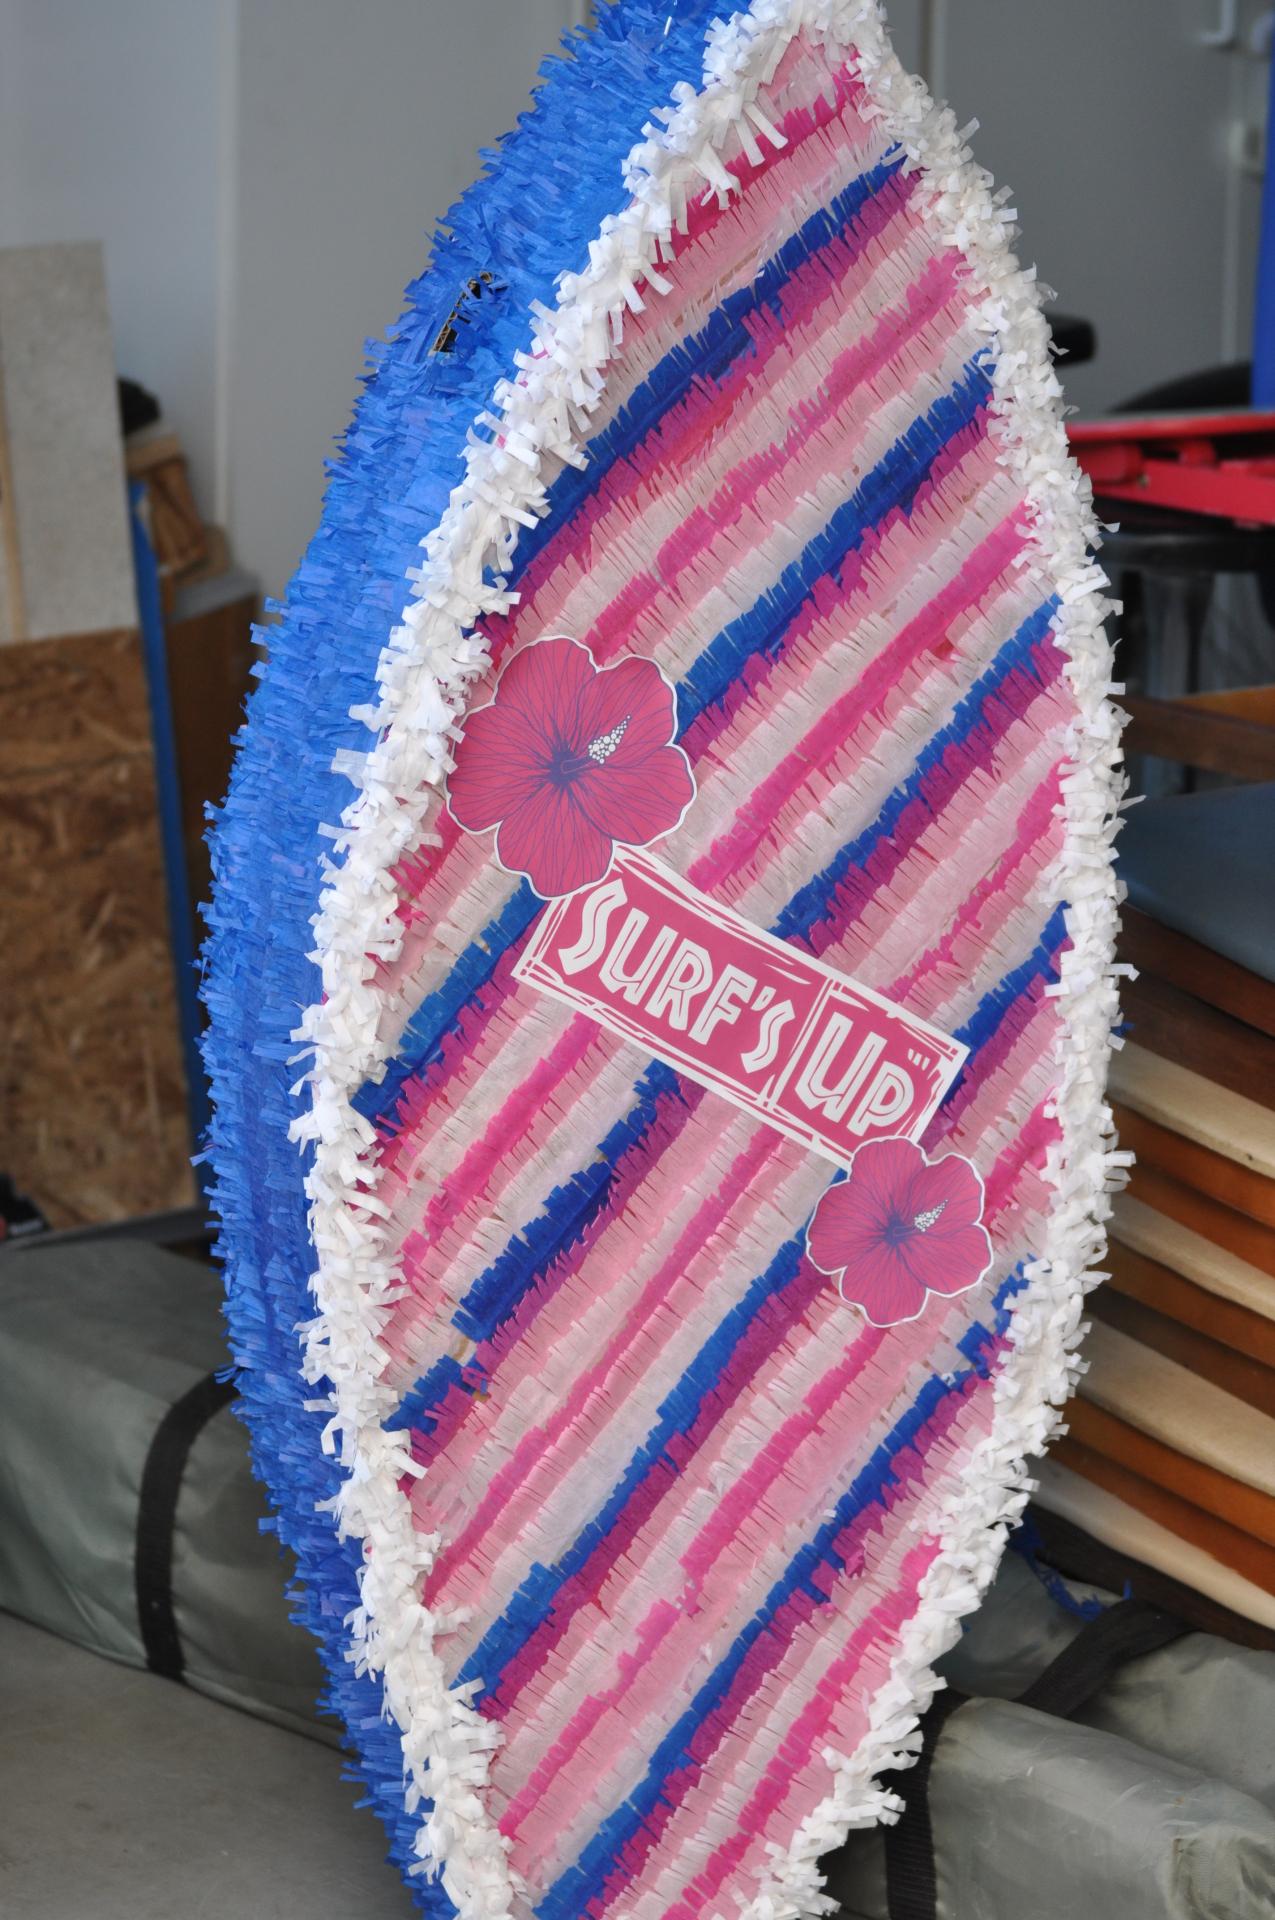 Surfboard Piñata